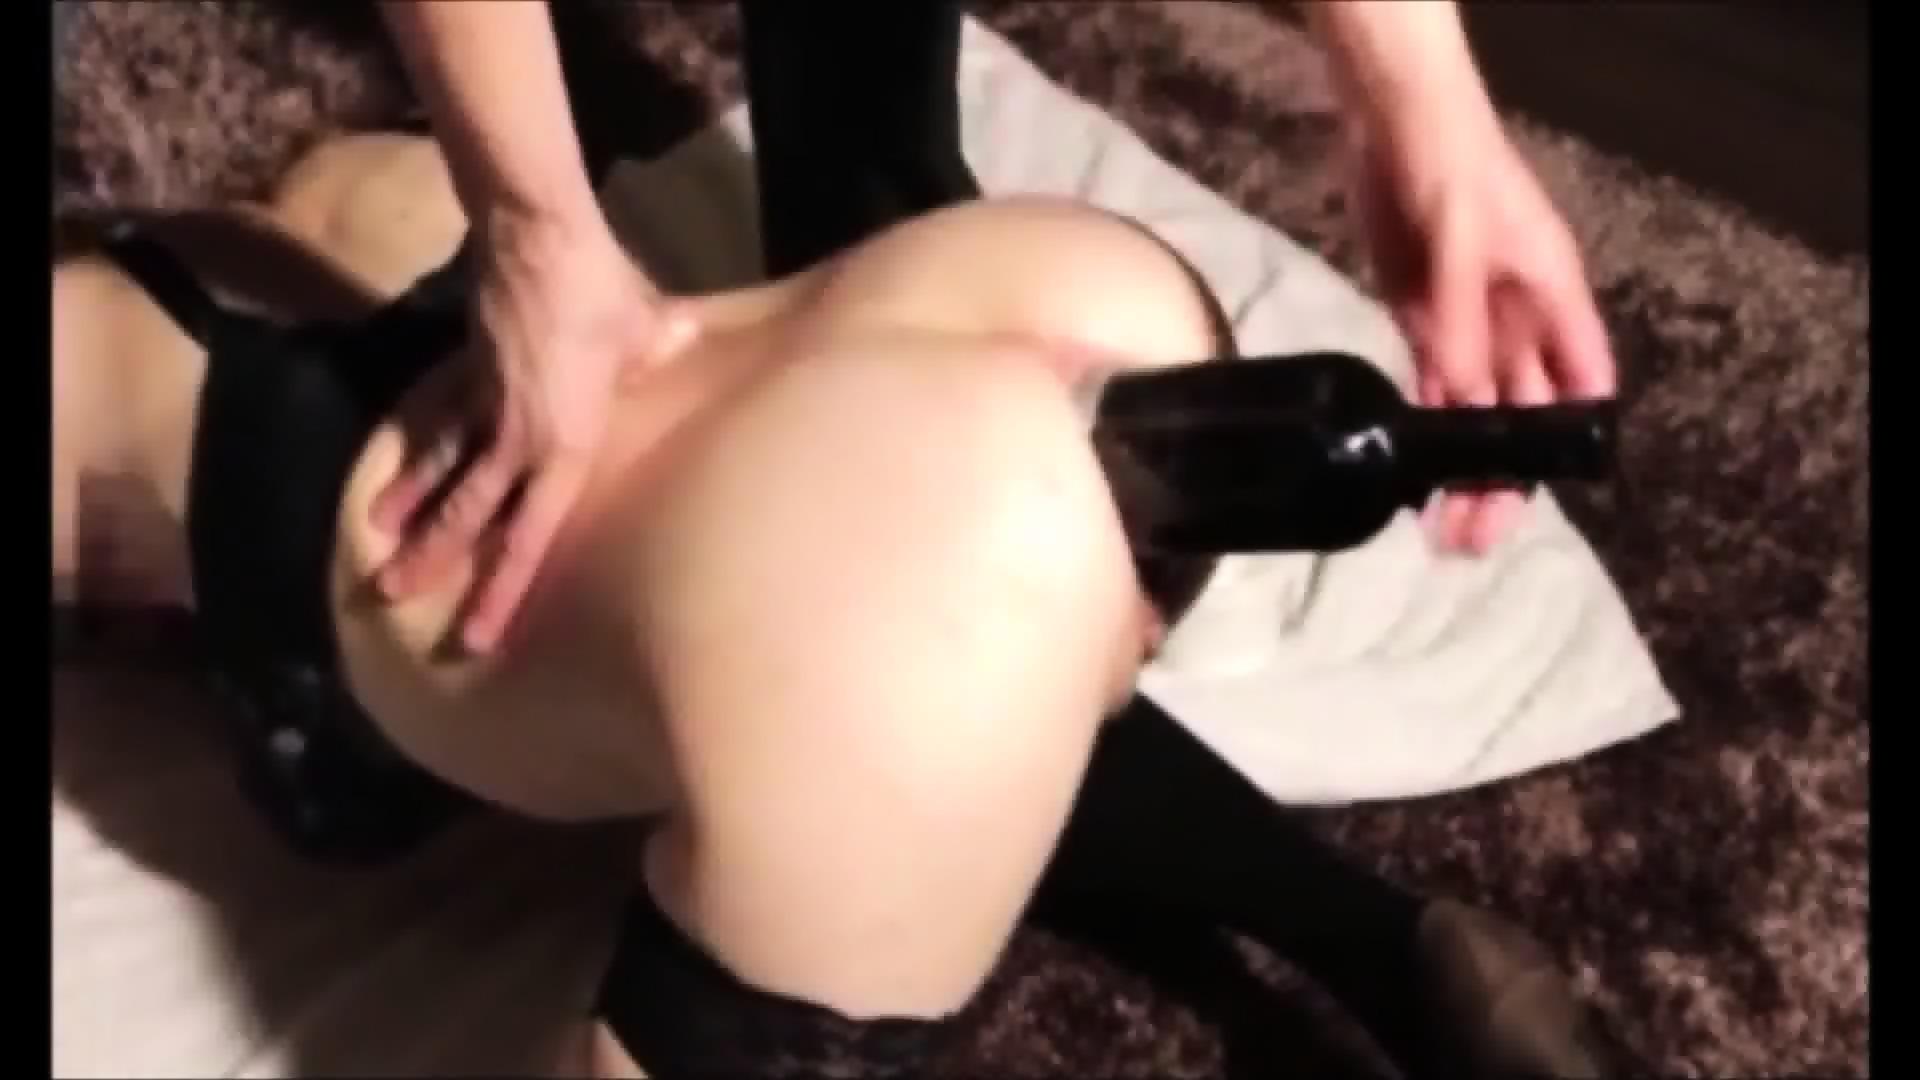 Dawnload film sexx porn mandatory